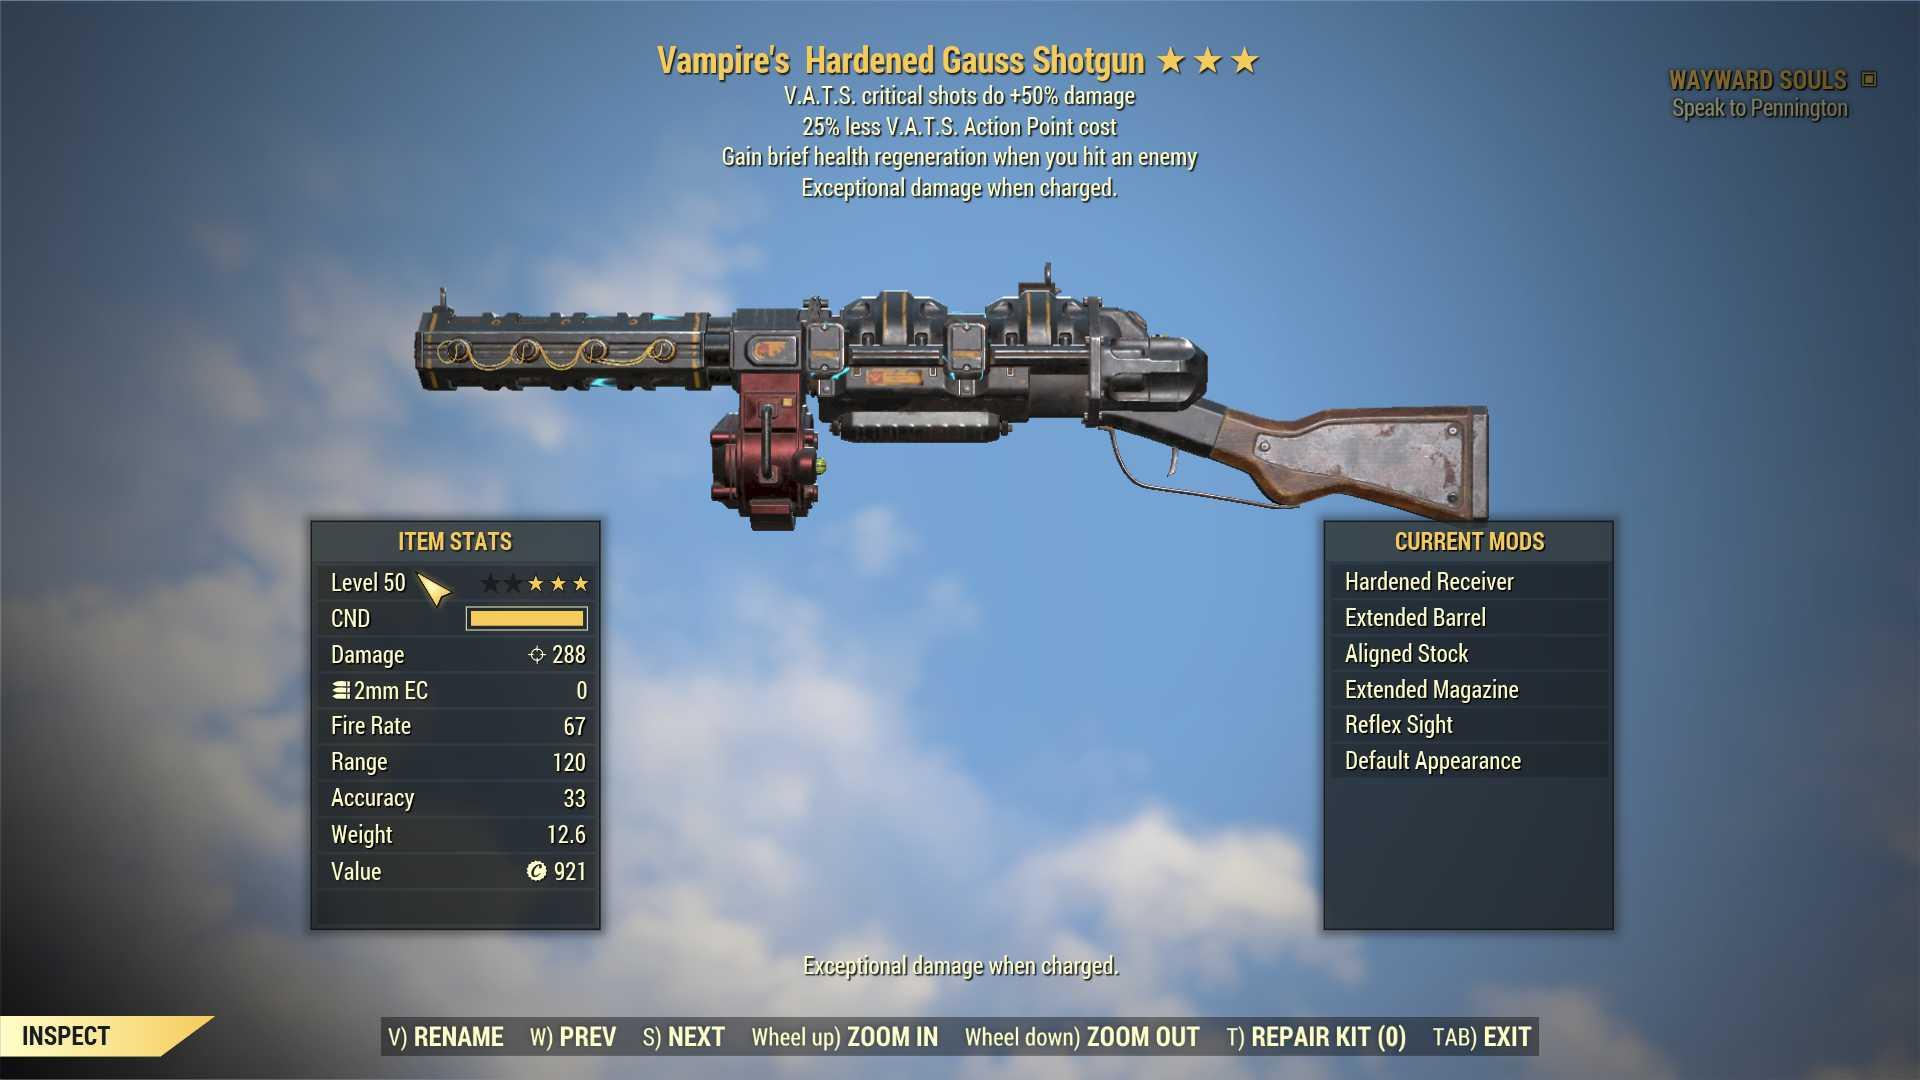 Vampire's Gauss Shotgun (+50% critical damage, 25% less VATS AP cost) FULL MODDED [Wastelanders]